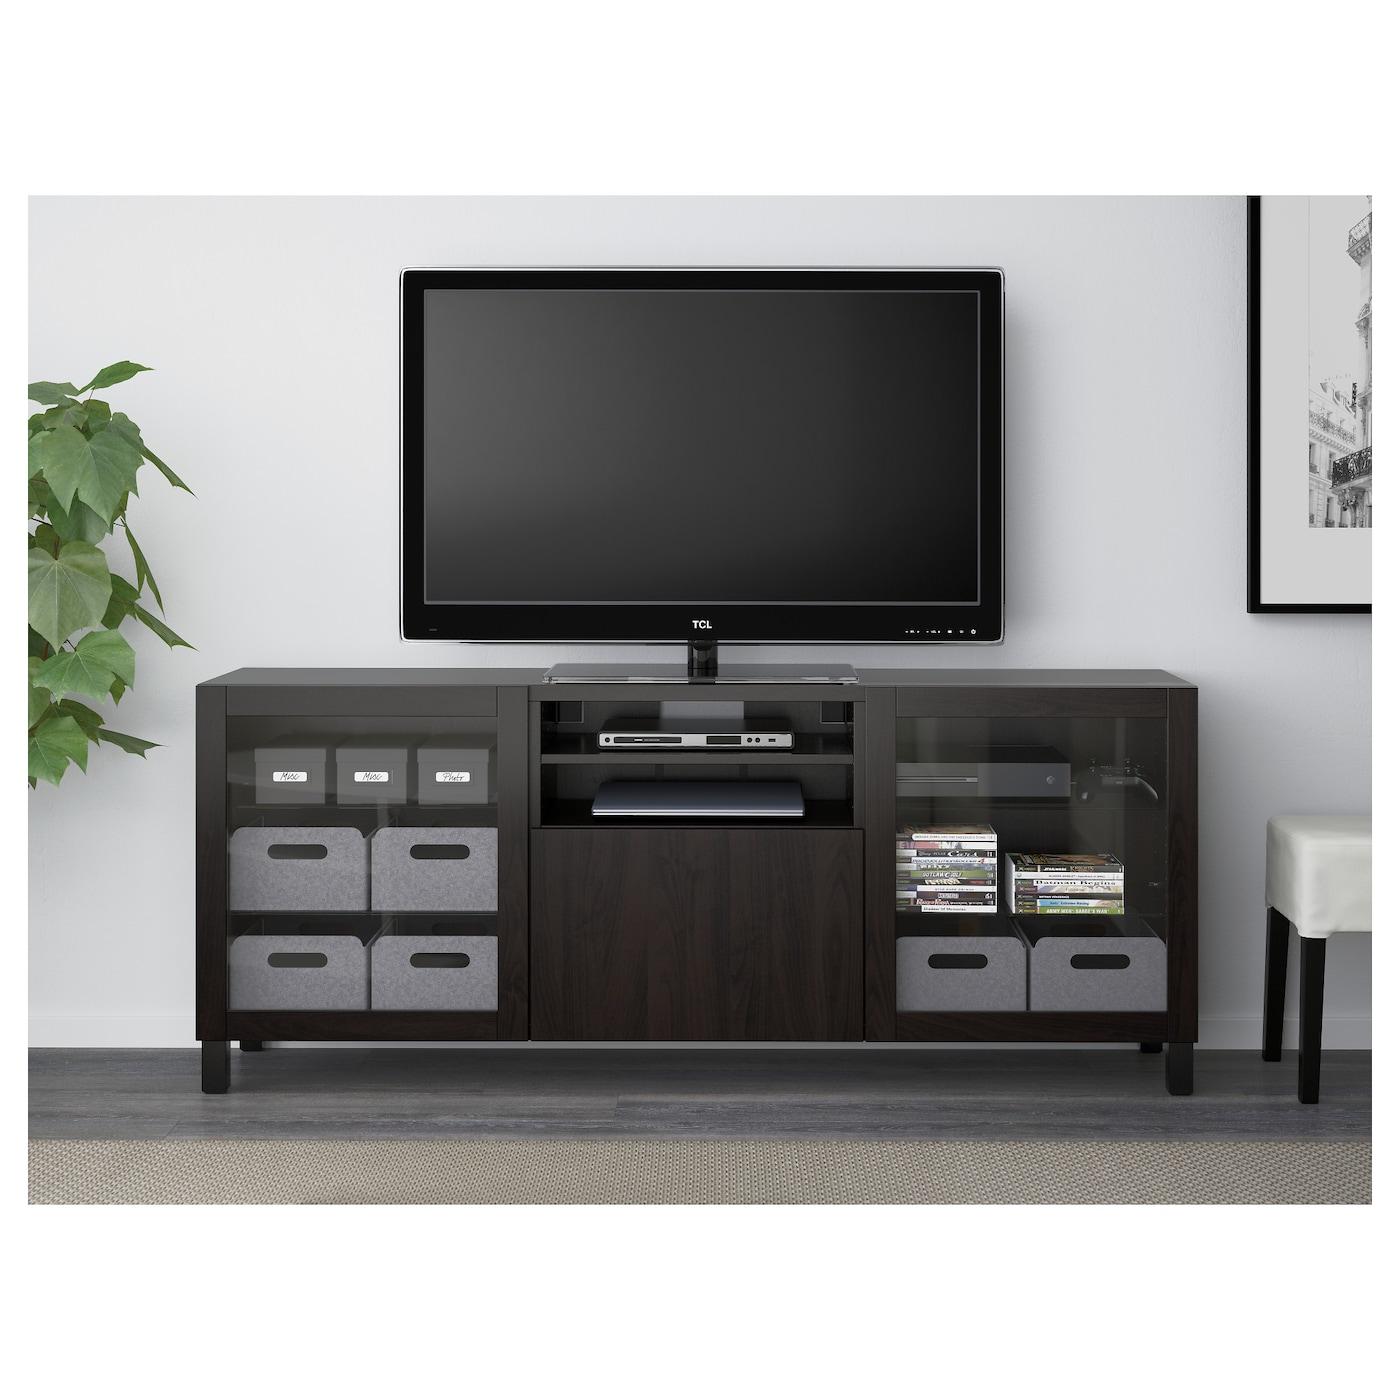 Best Tv Bench With Drawers Lappviken Sindvik Black Brown Clear Glass 180x40x74 Cm Ikea